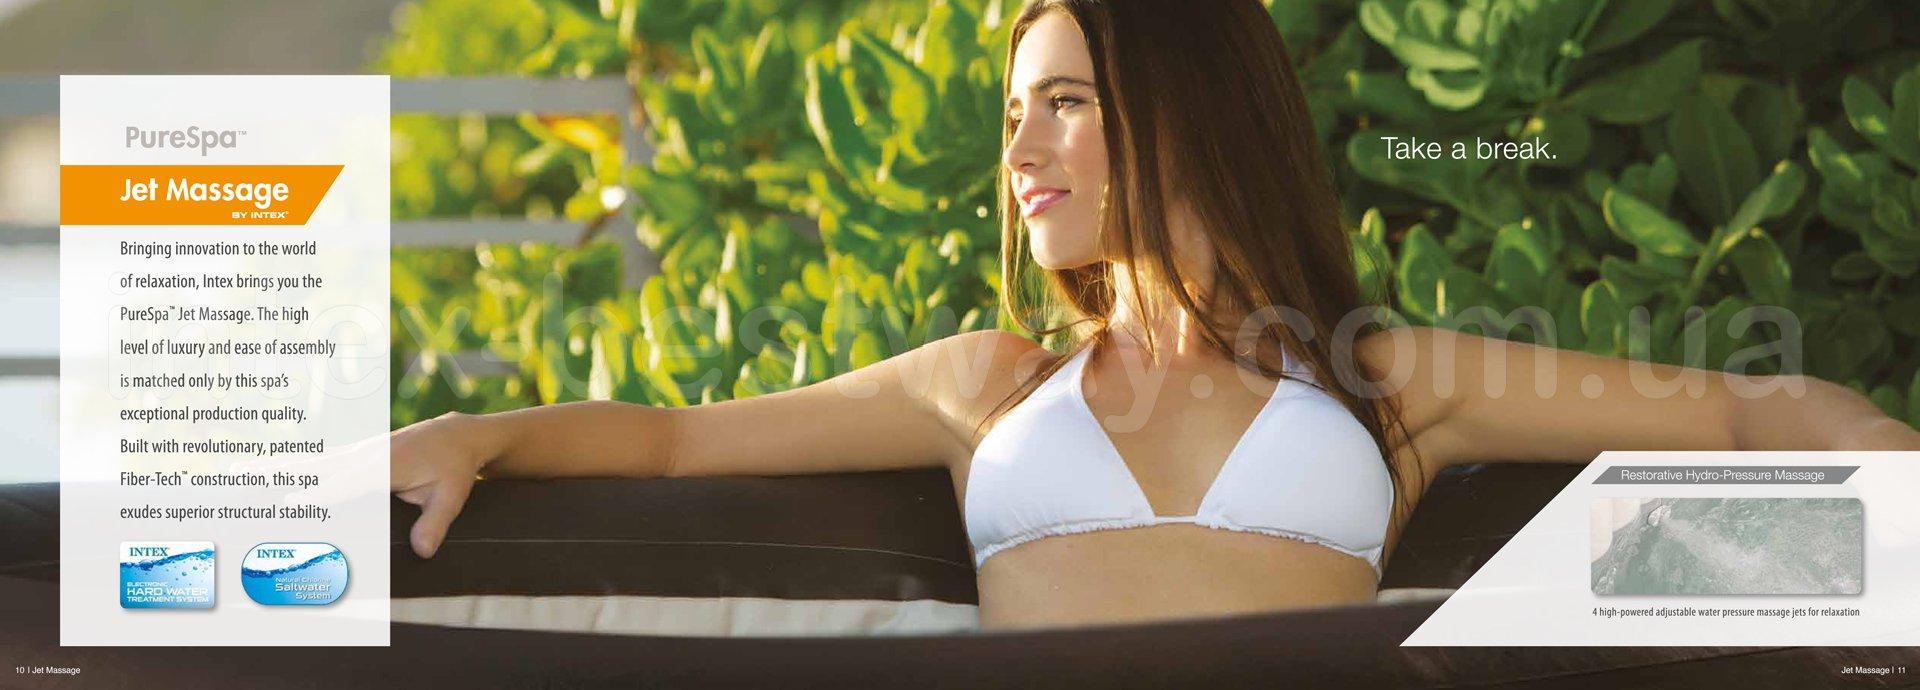 Надувной СПА-Джакузи Intex PureSpa Jet Massage